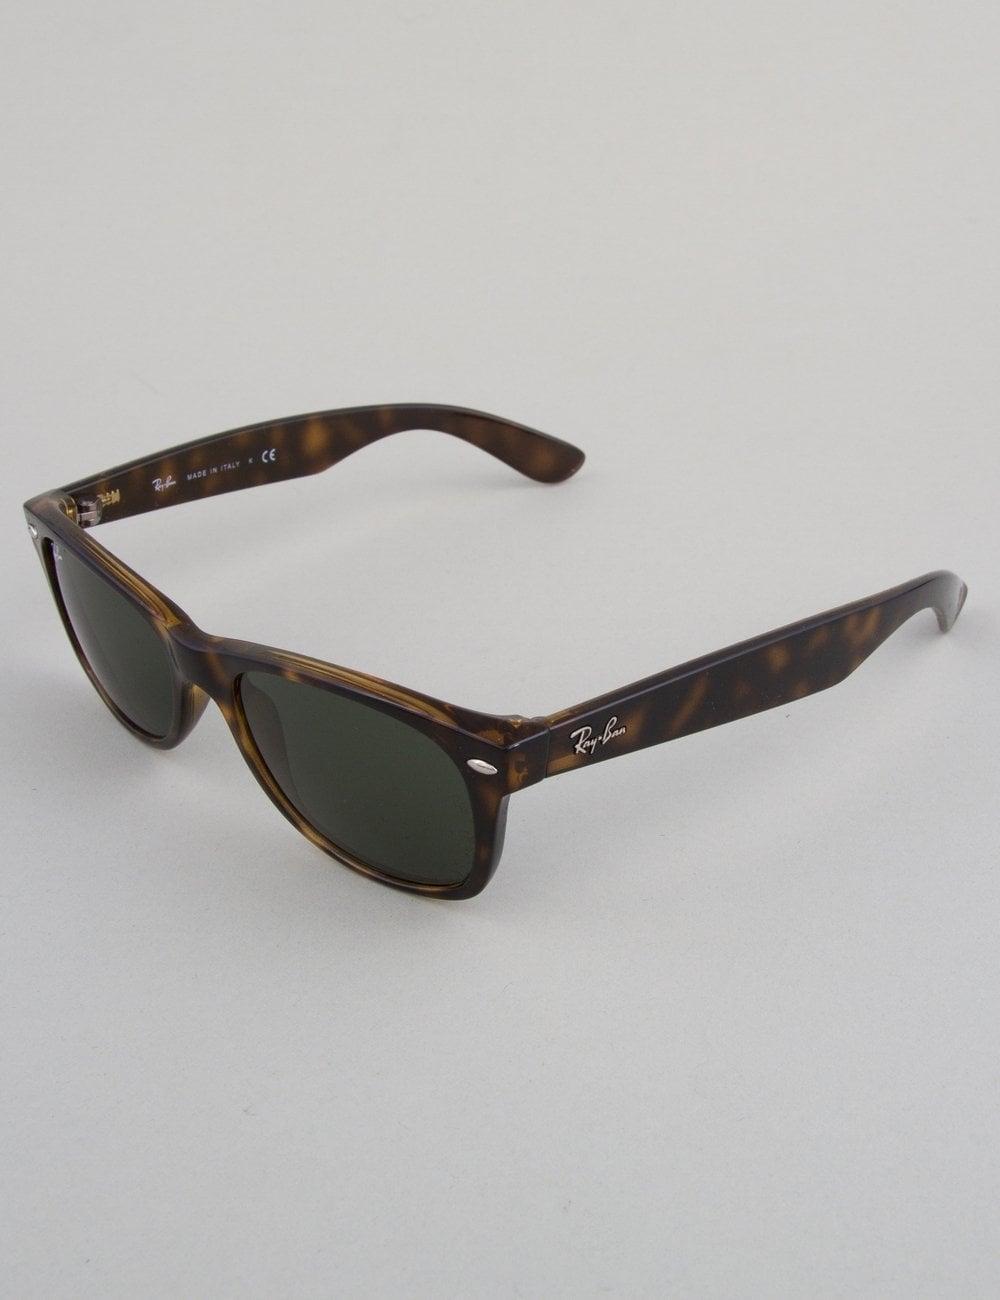 994b09ed418 Ray-Ban New Wayfarer Sunglasses - Tortoise    Crystal Green ...